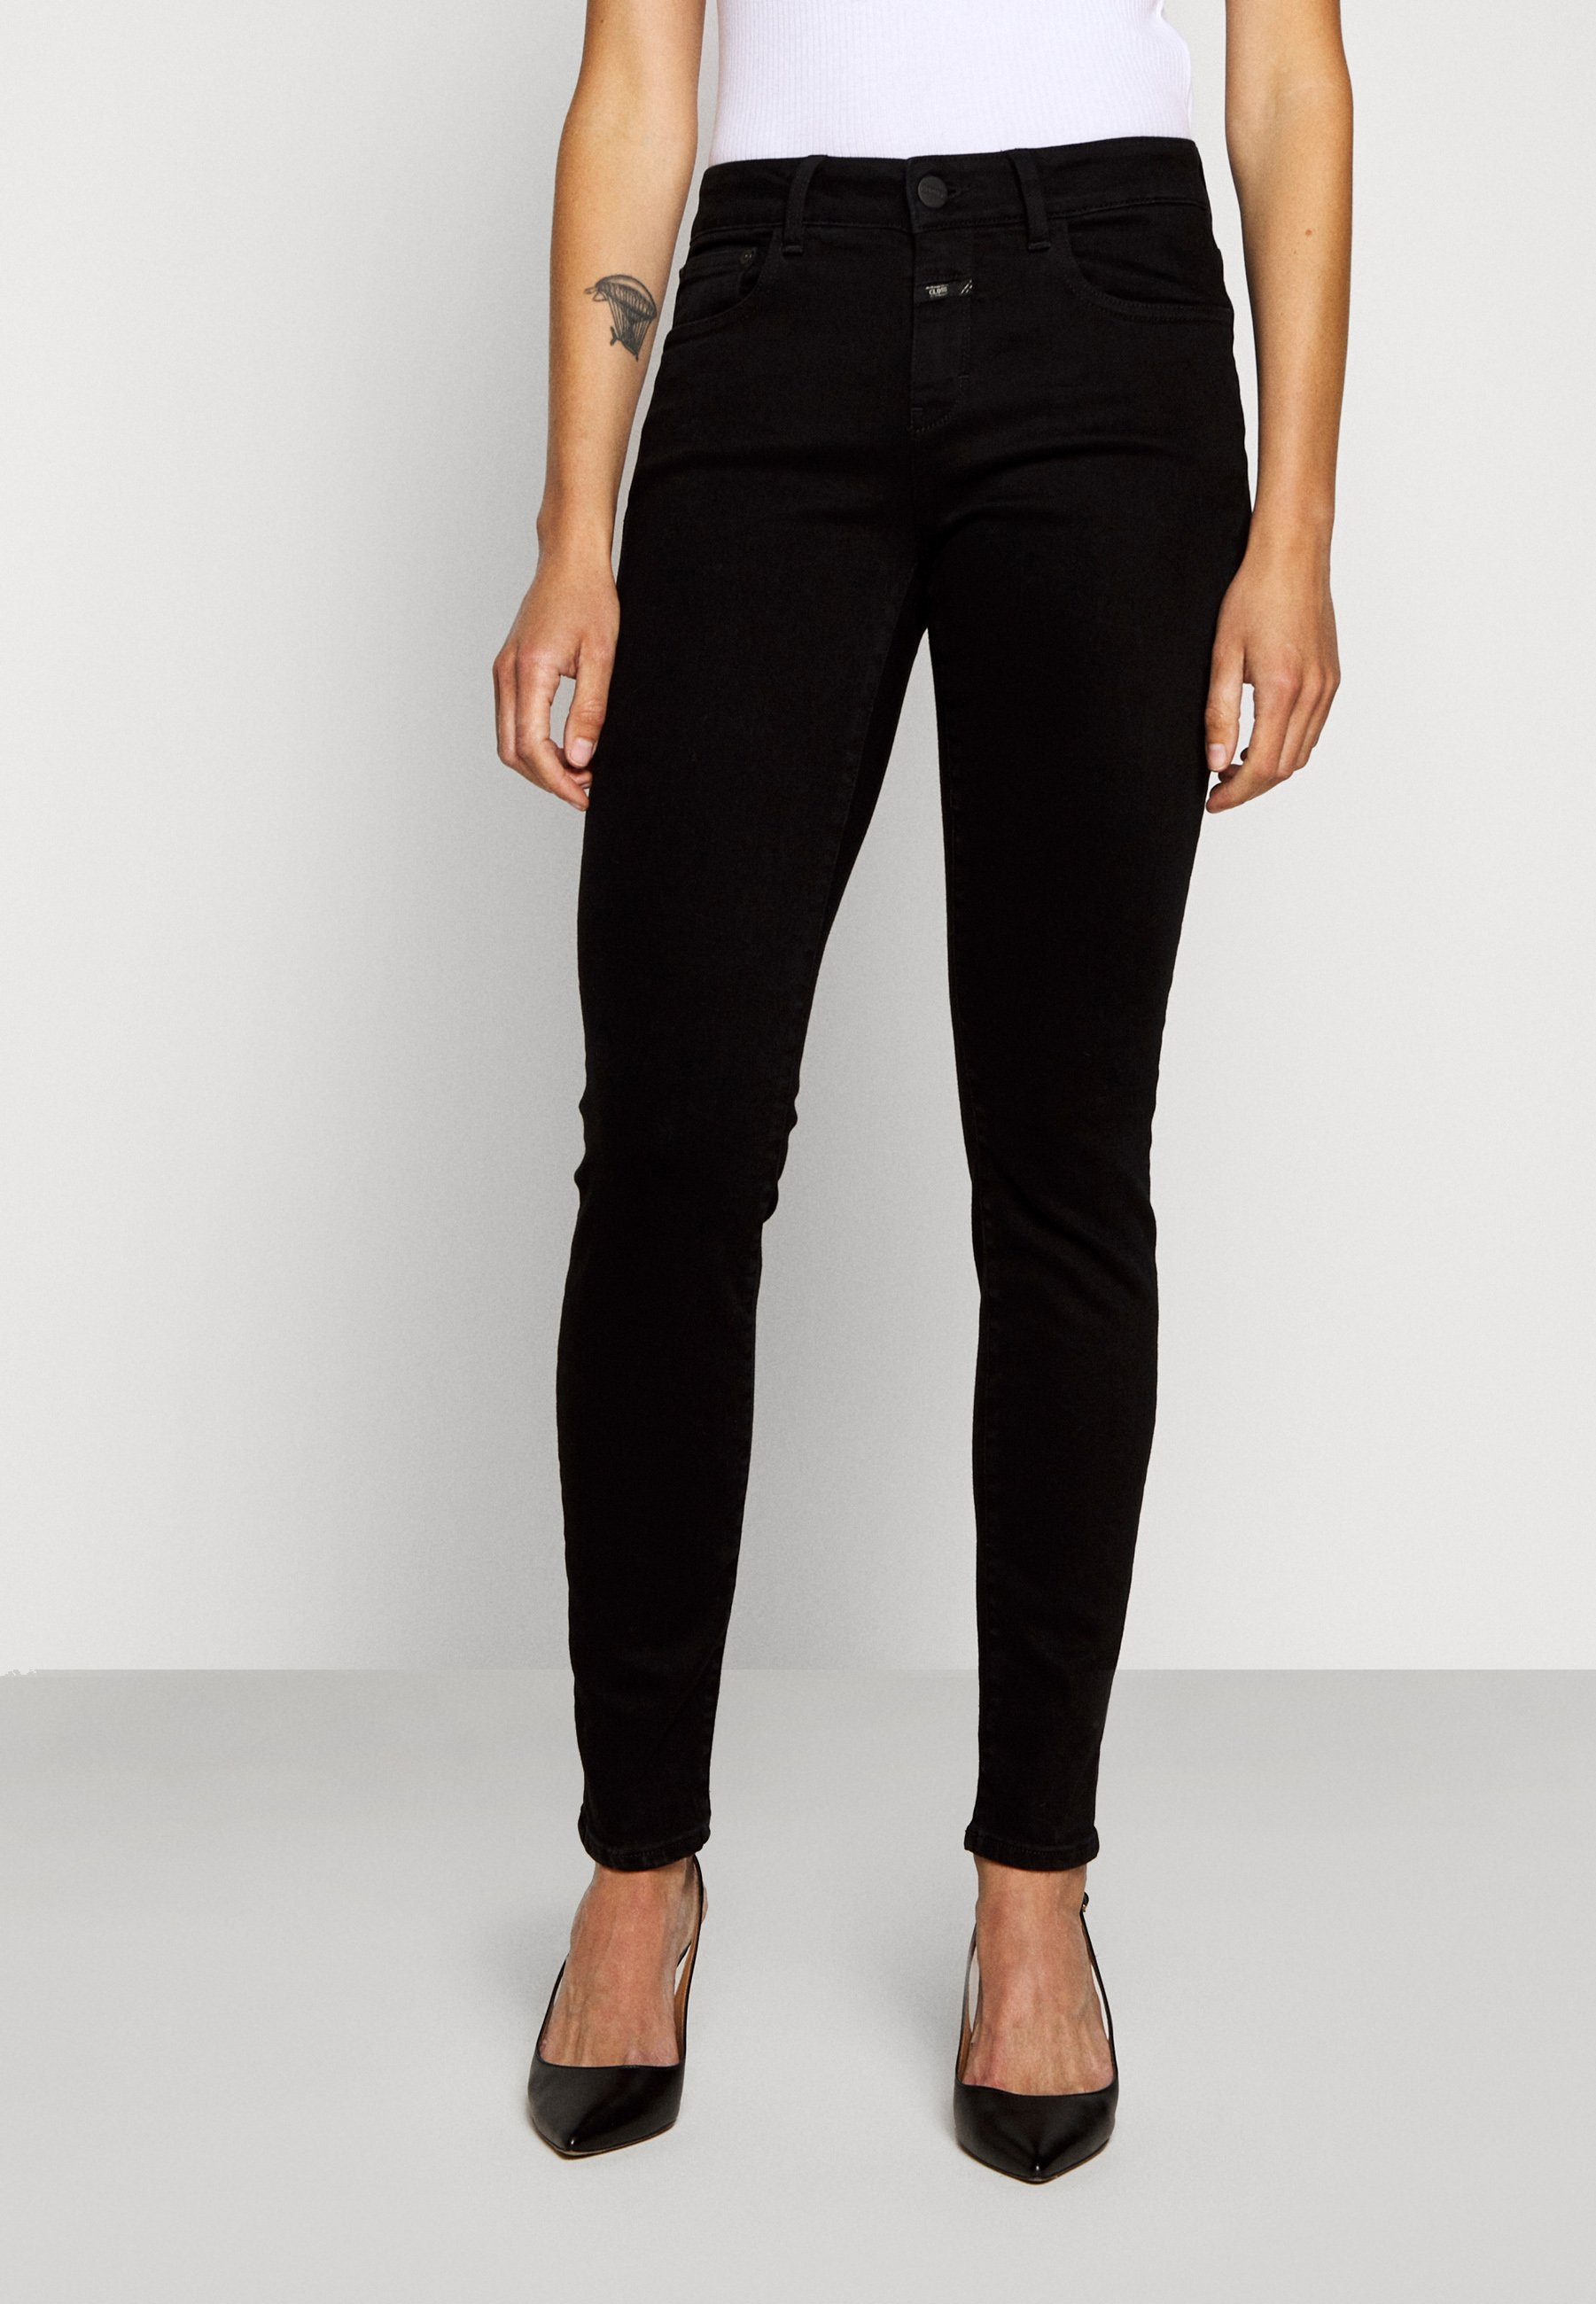 CLOSED BAKER  - Jean slim - black - Jeans Femme icuHo